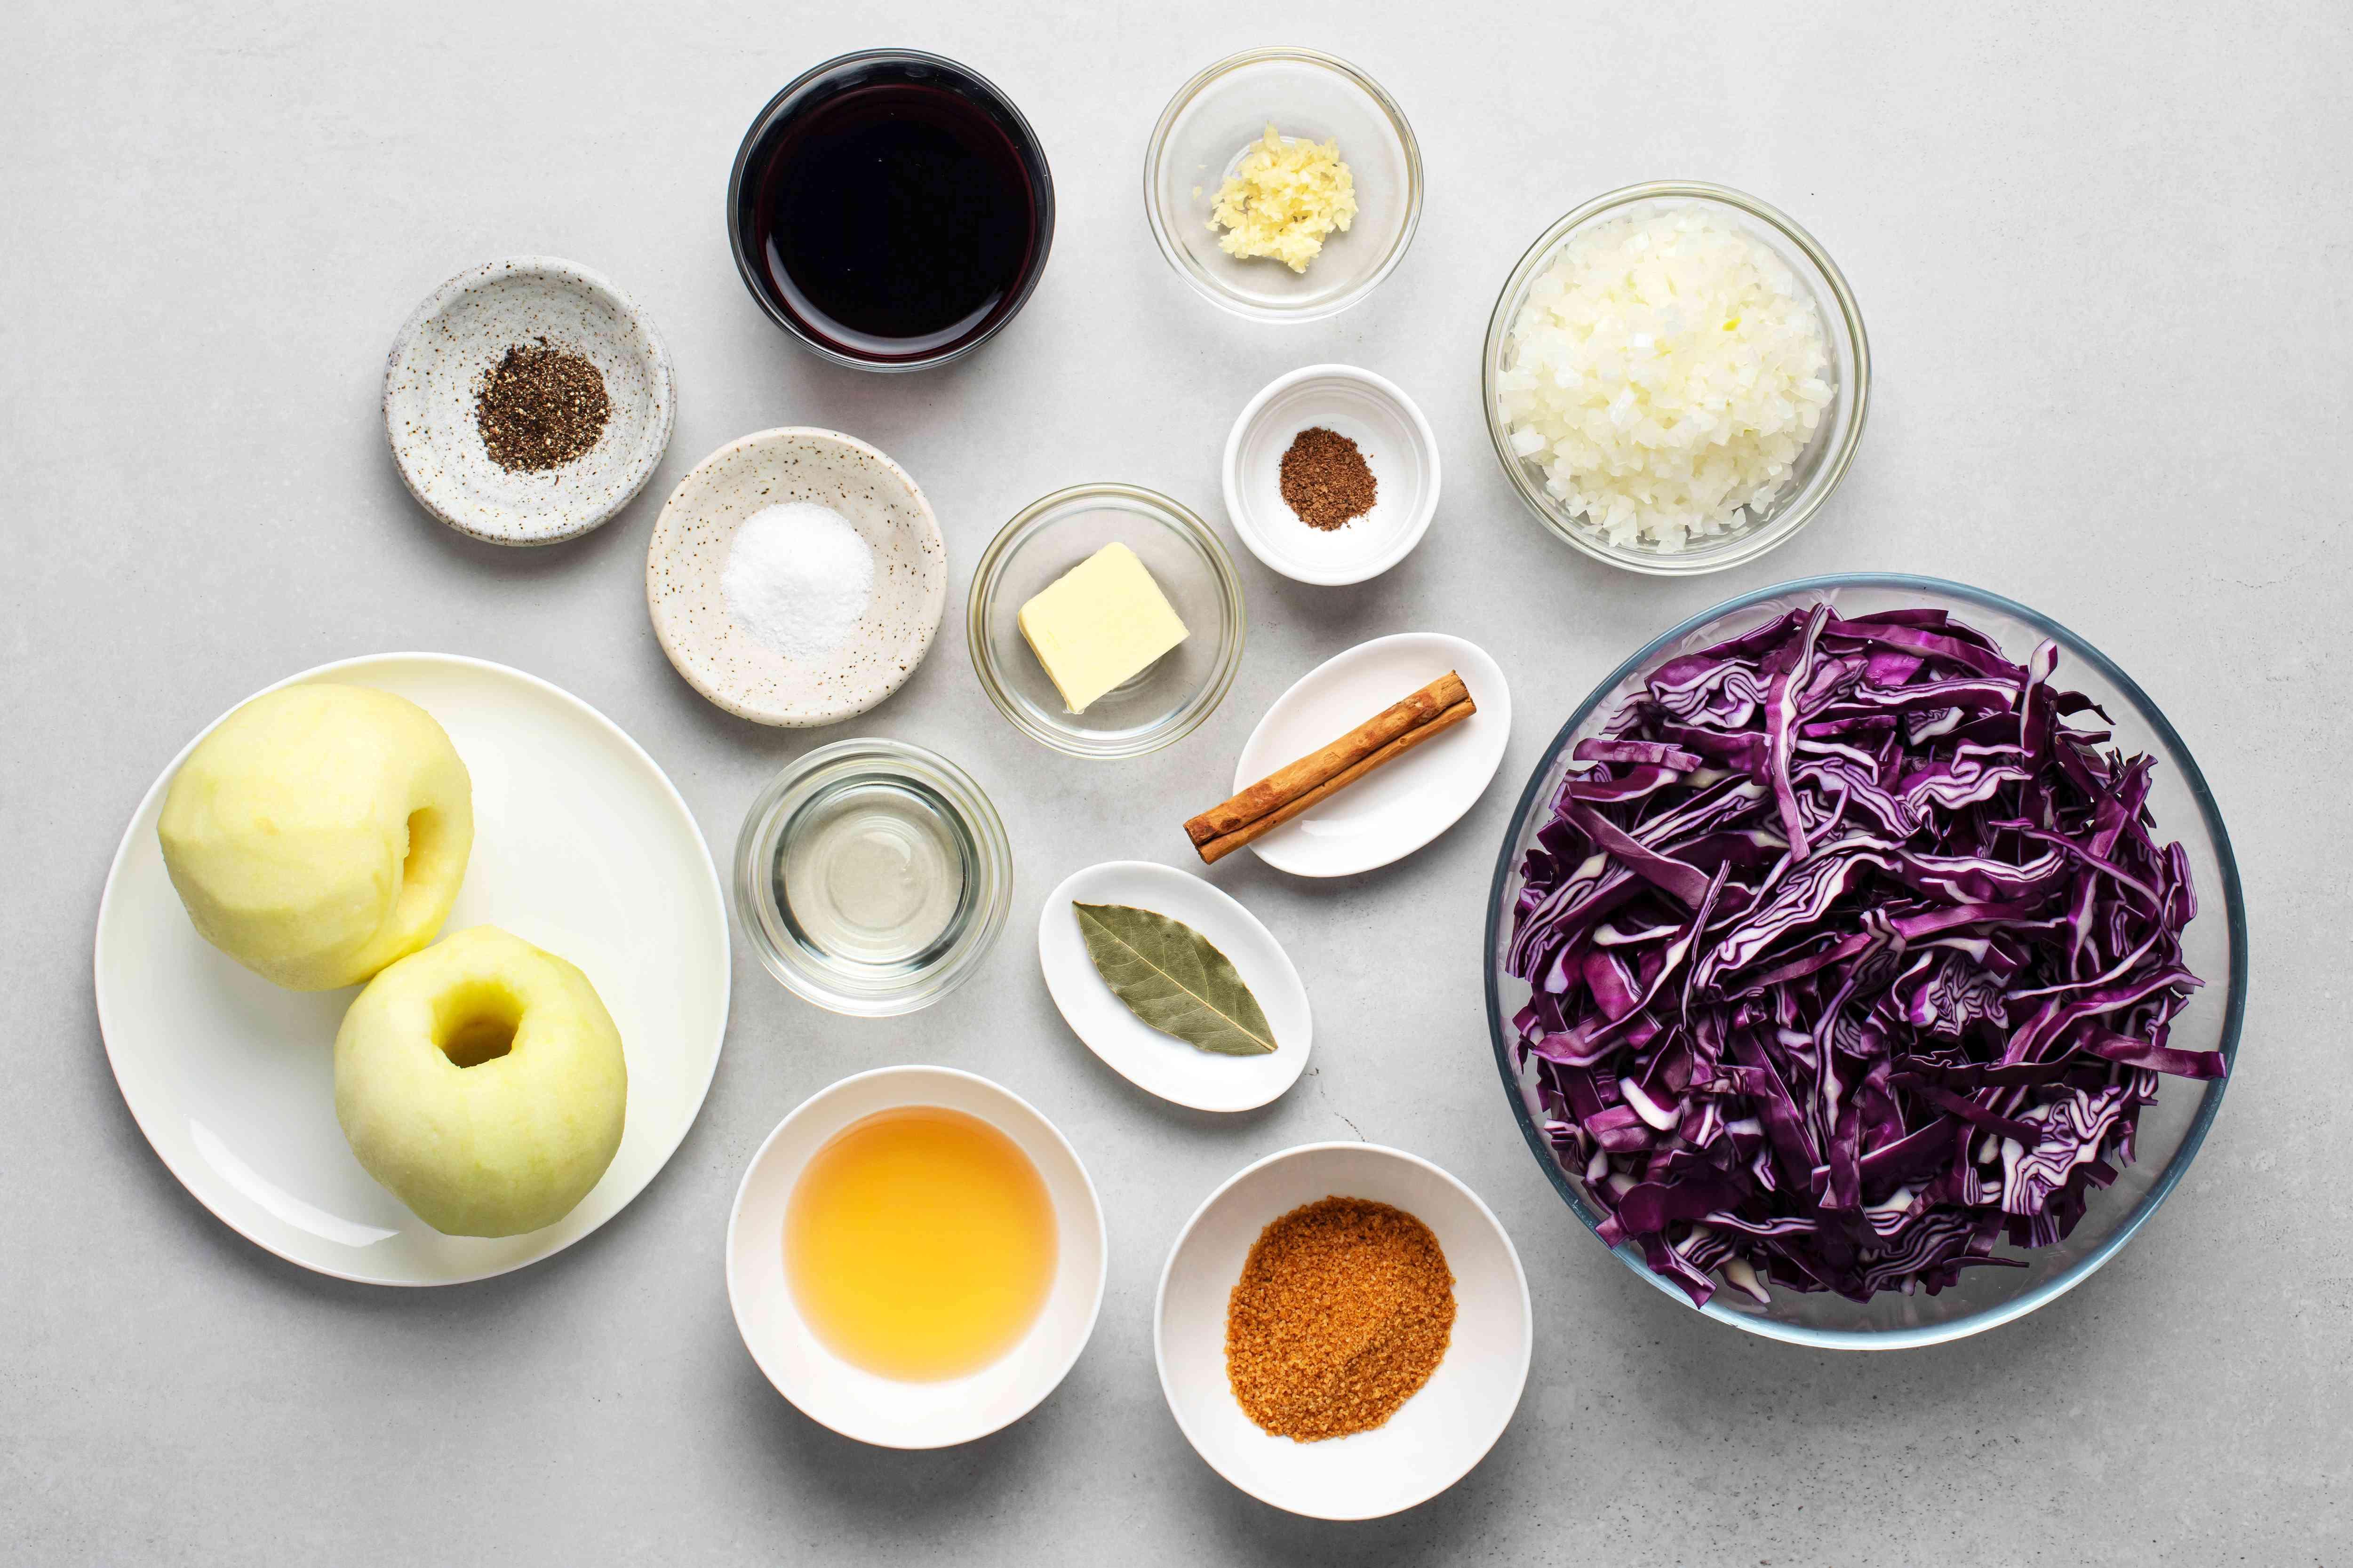 cabbage ingredients